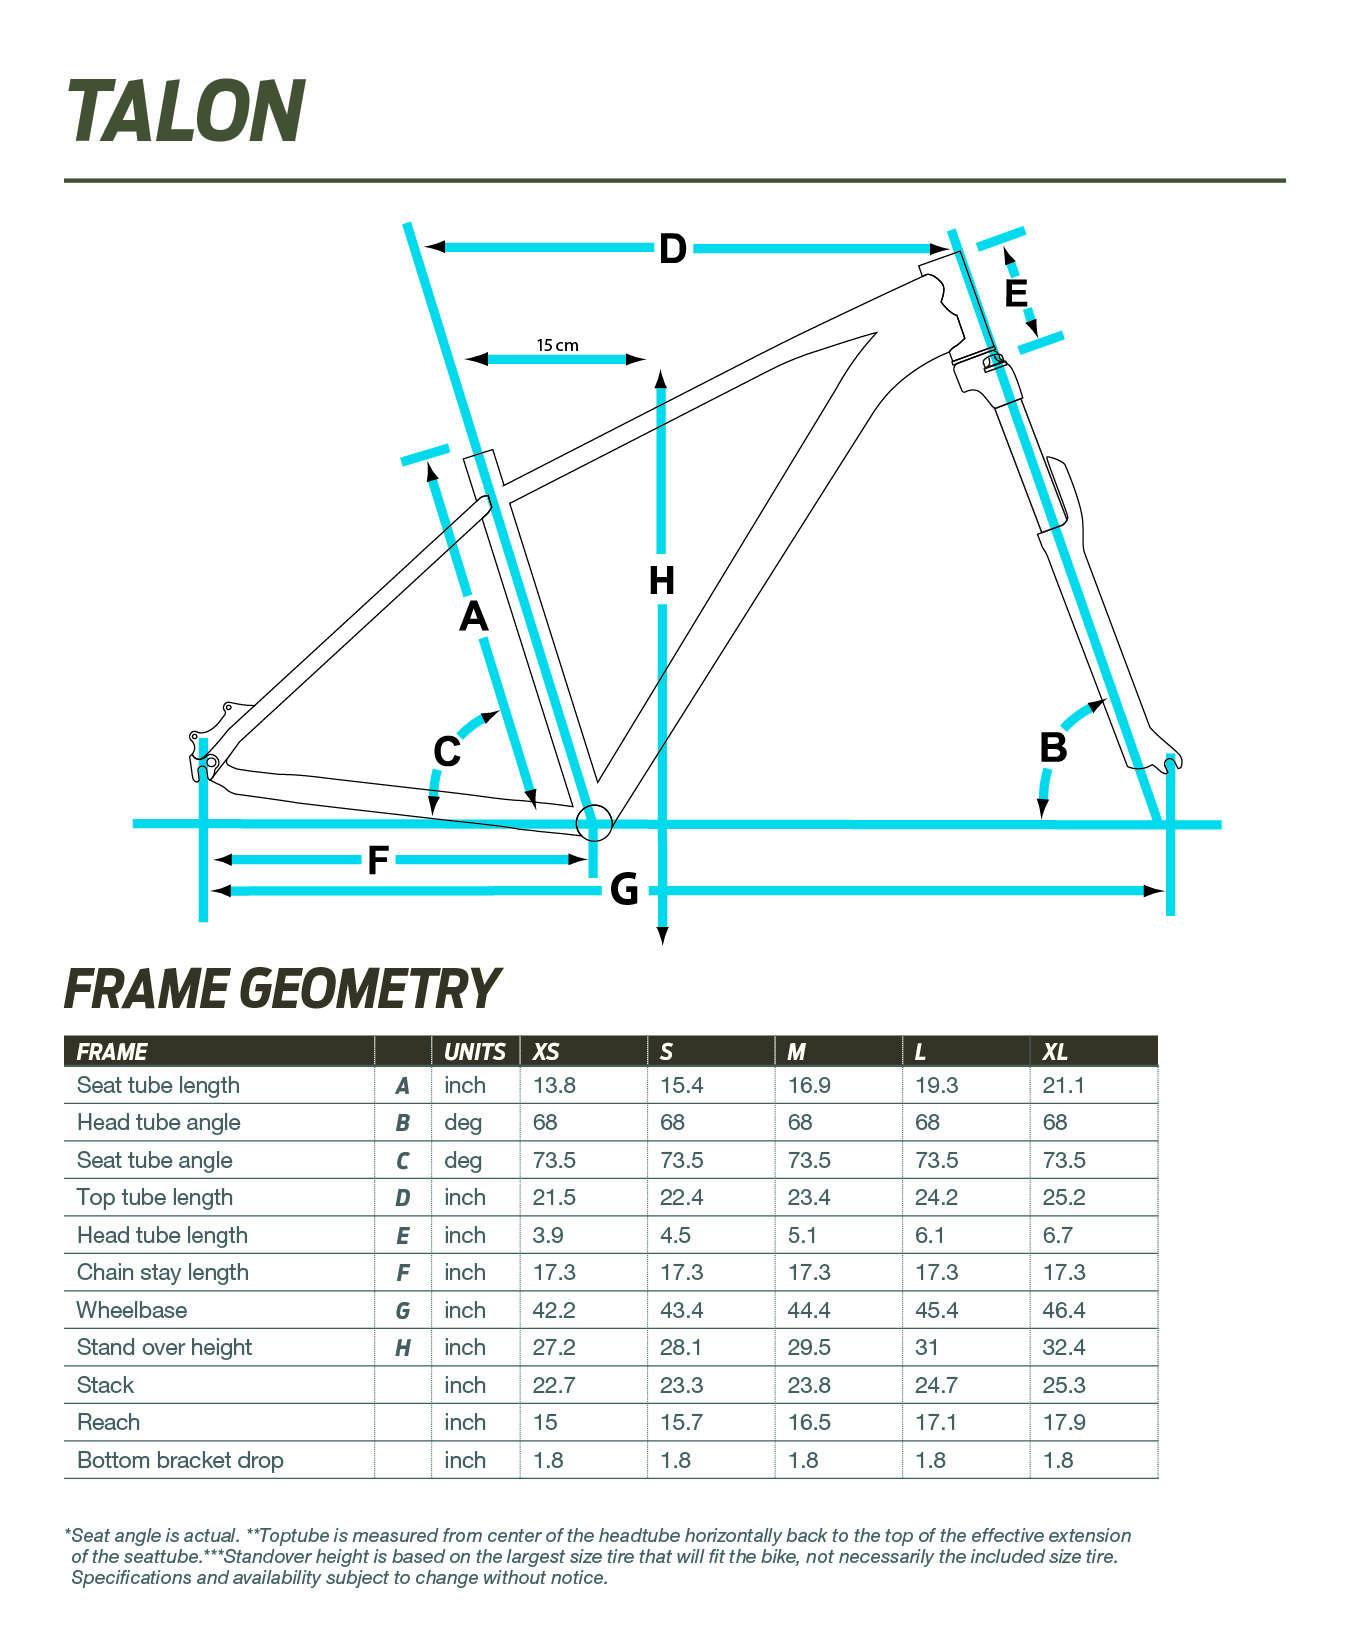 Giant Talon geometry chart